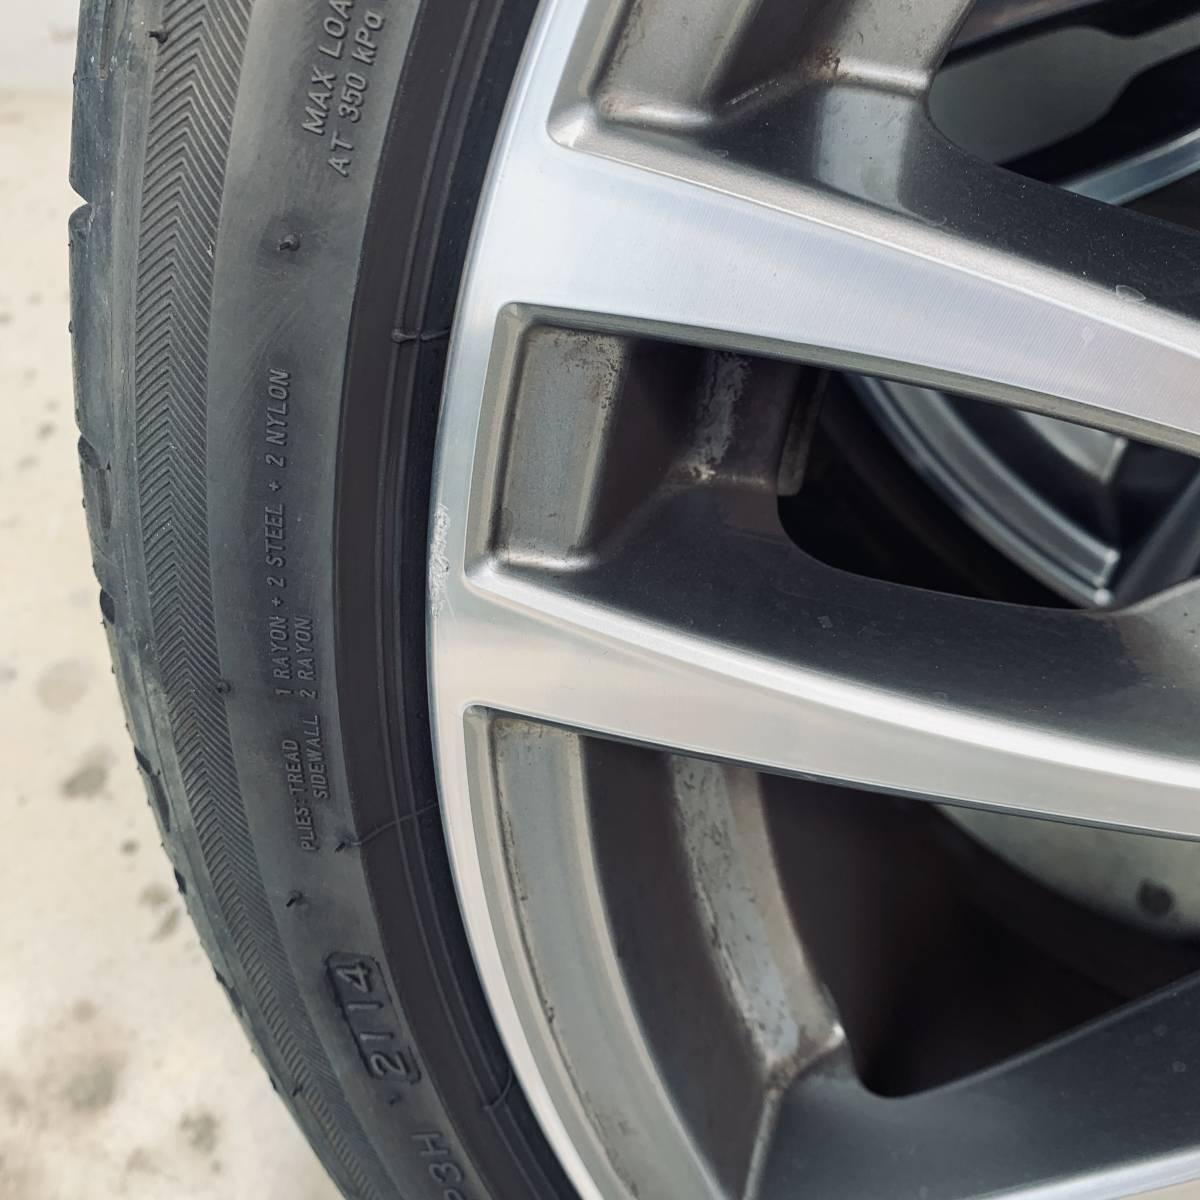 BMW 純正 オプション 19インチ スタースポーク スタイリング403M Mスポーツ PCD:120 F: 8.0J +36 R: 8.5J +47 F30 F31 3シリーズ_画像5